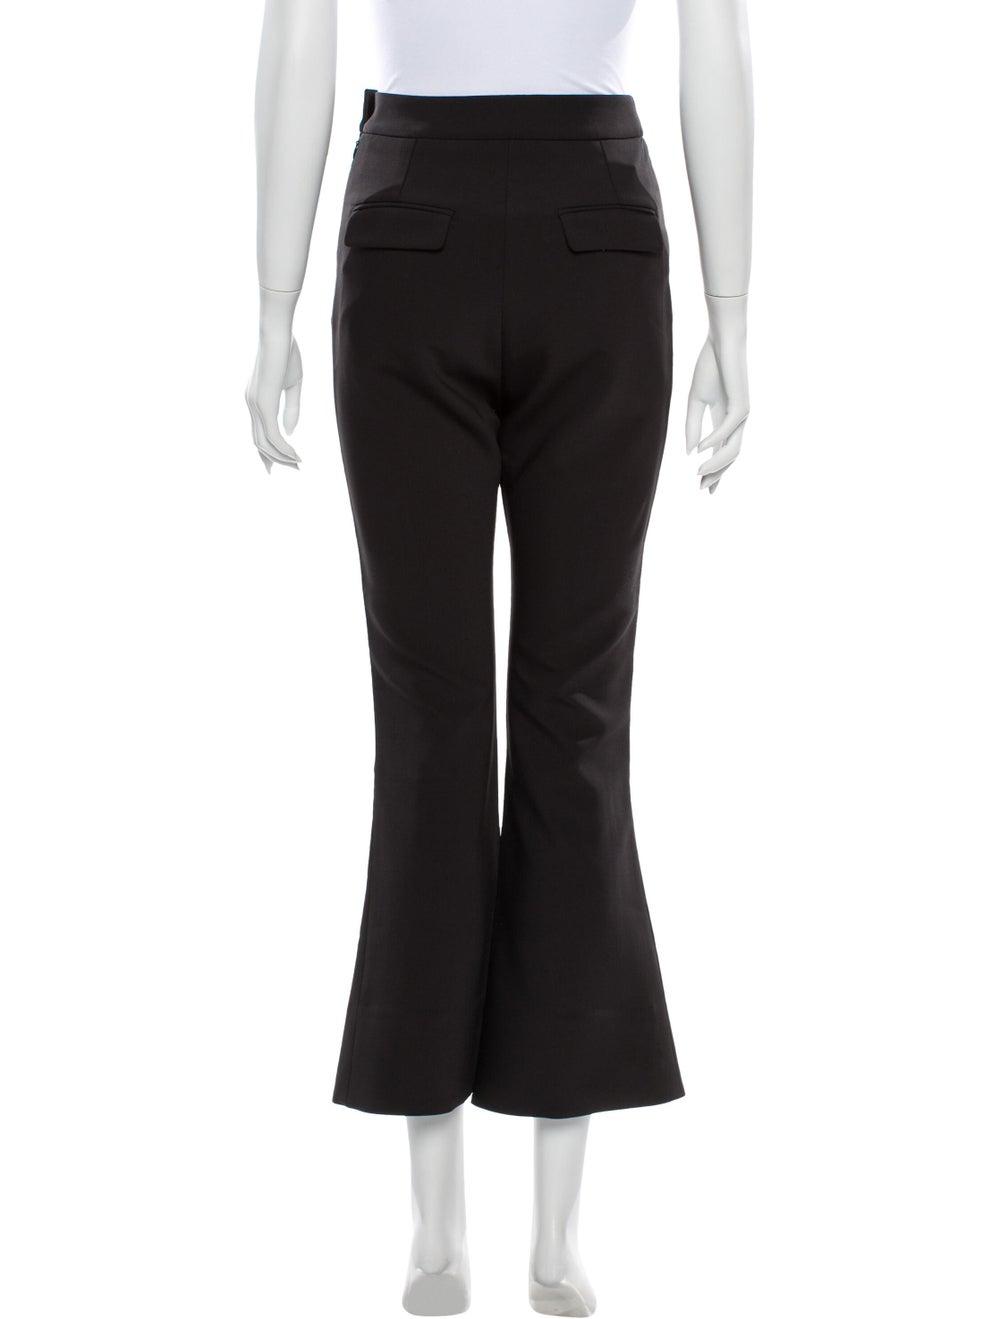 Ellery Flared Pants Black - image 3